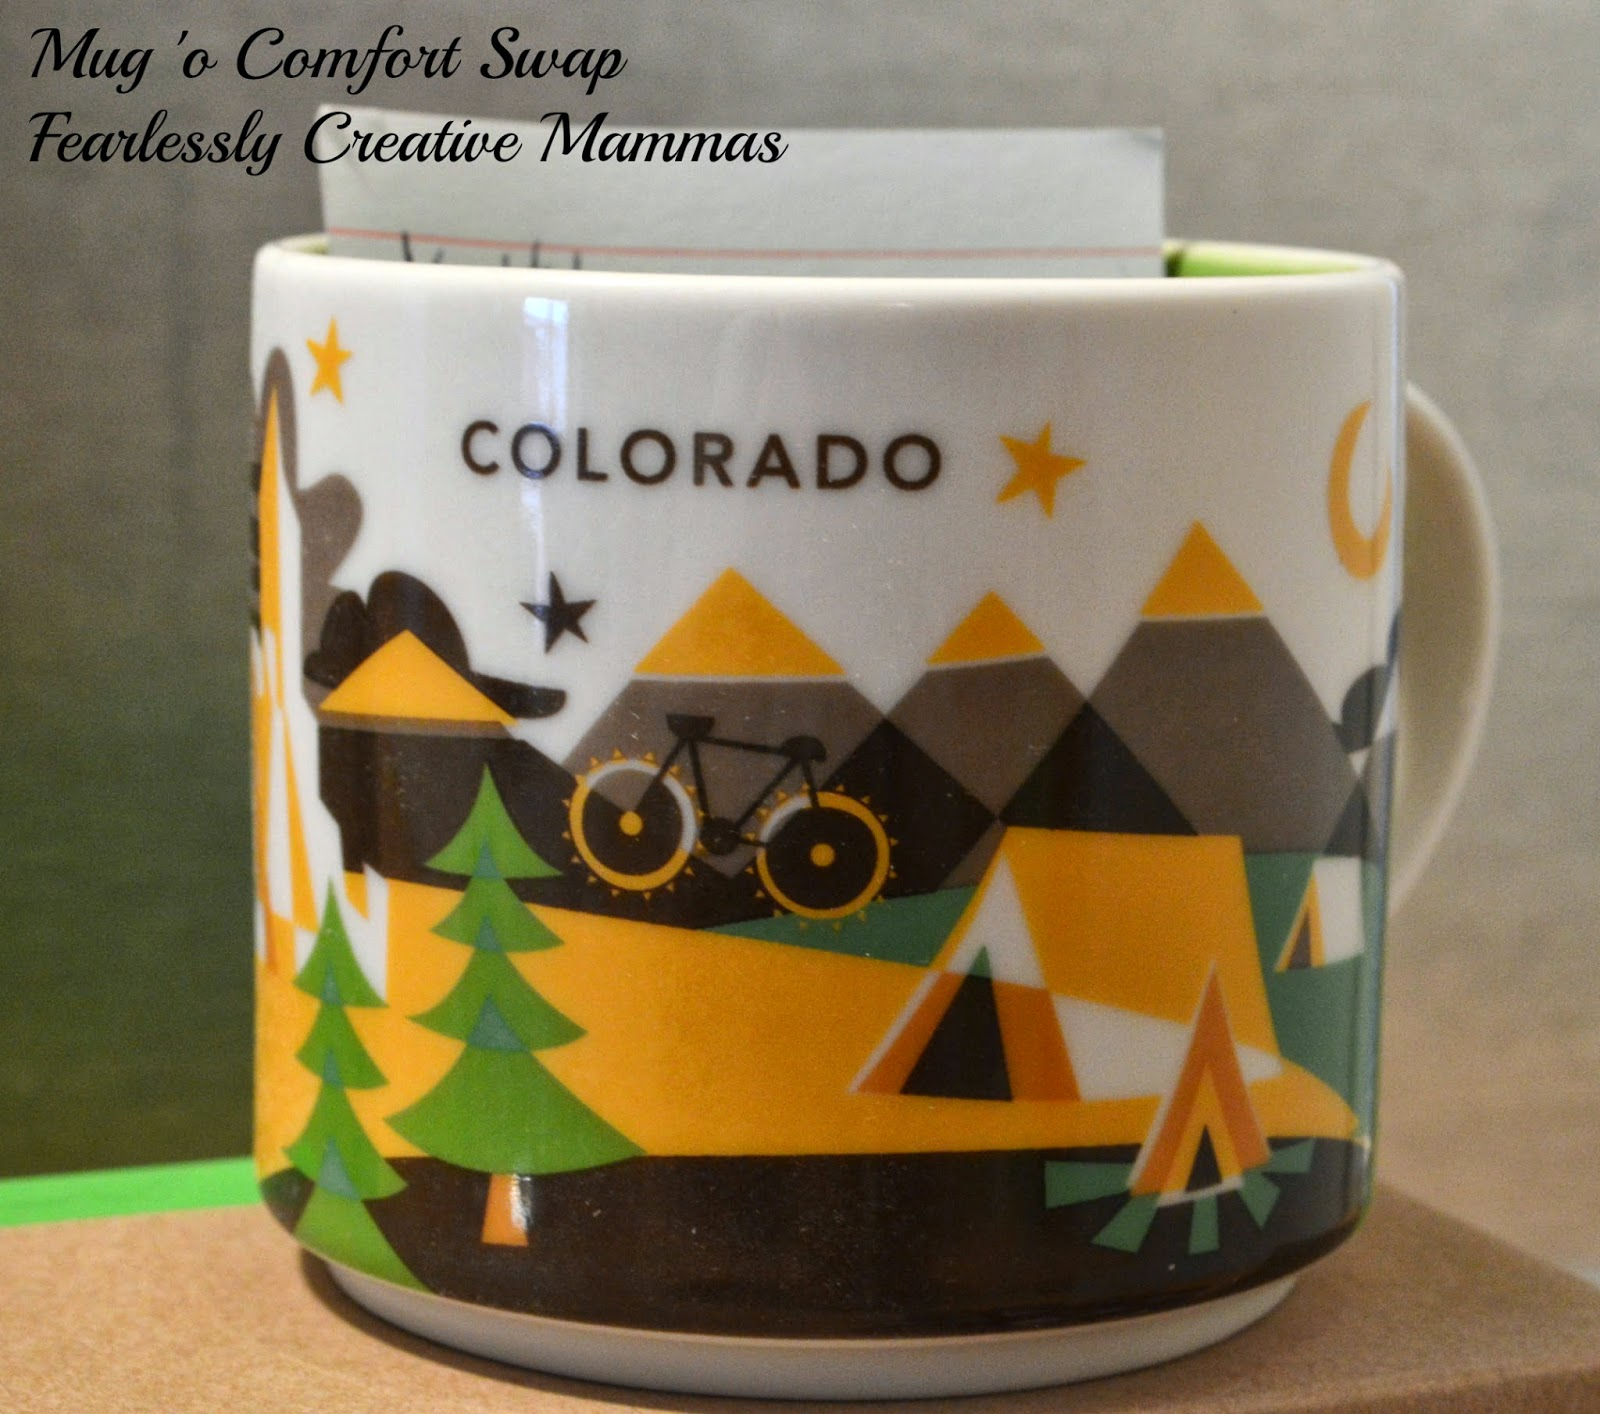 Mug o Comfort Swap Fearlessly Creative Mammas